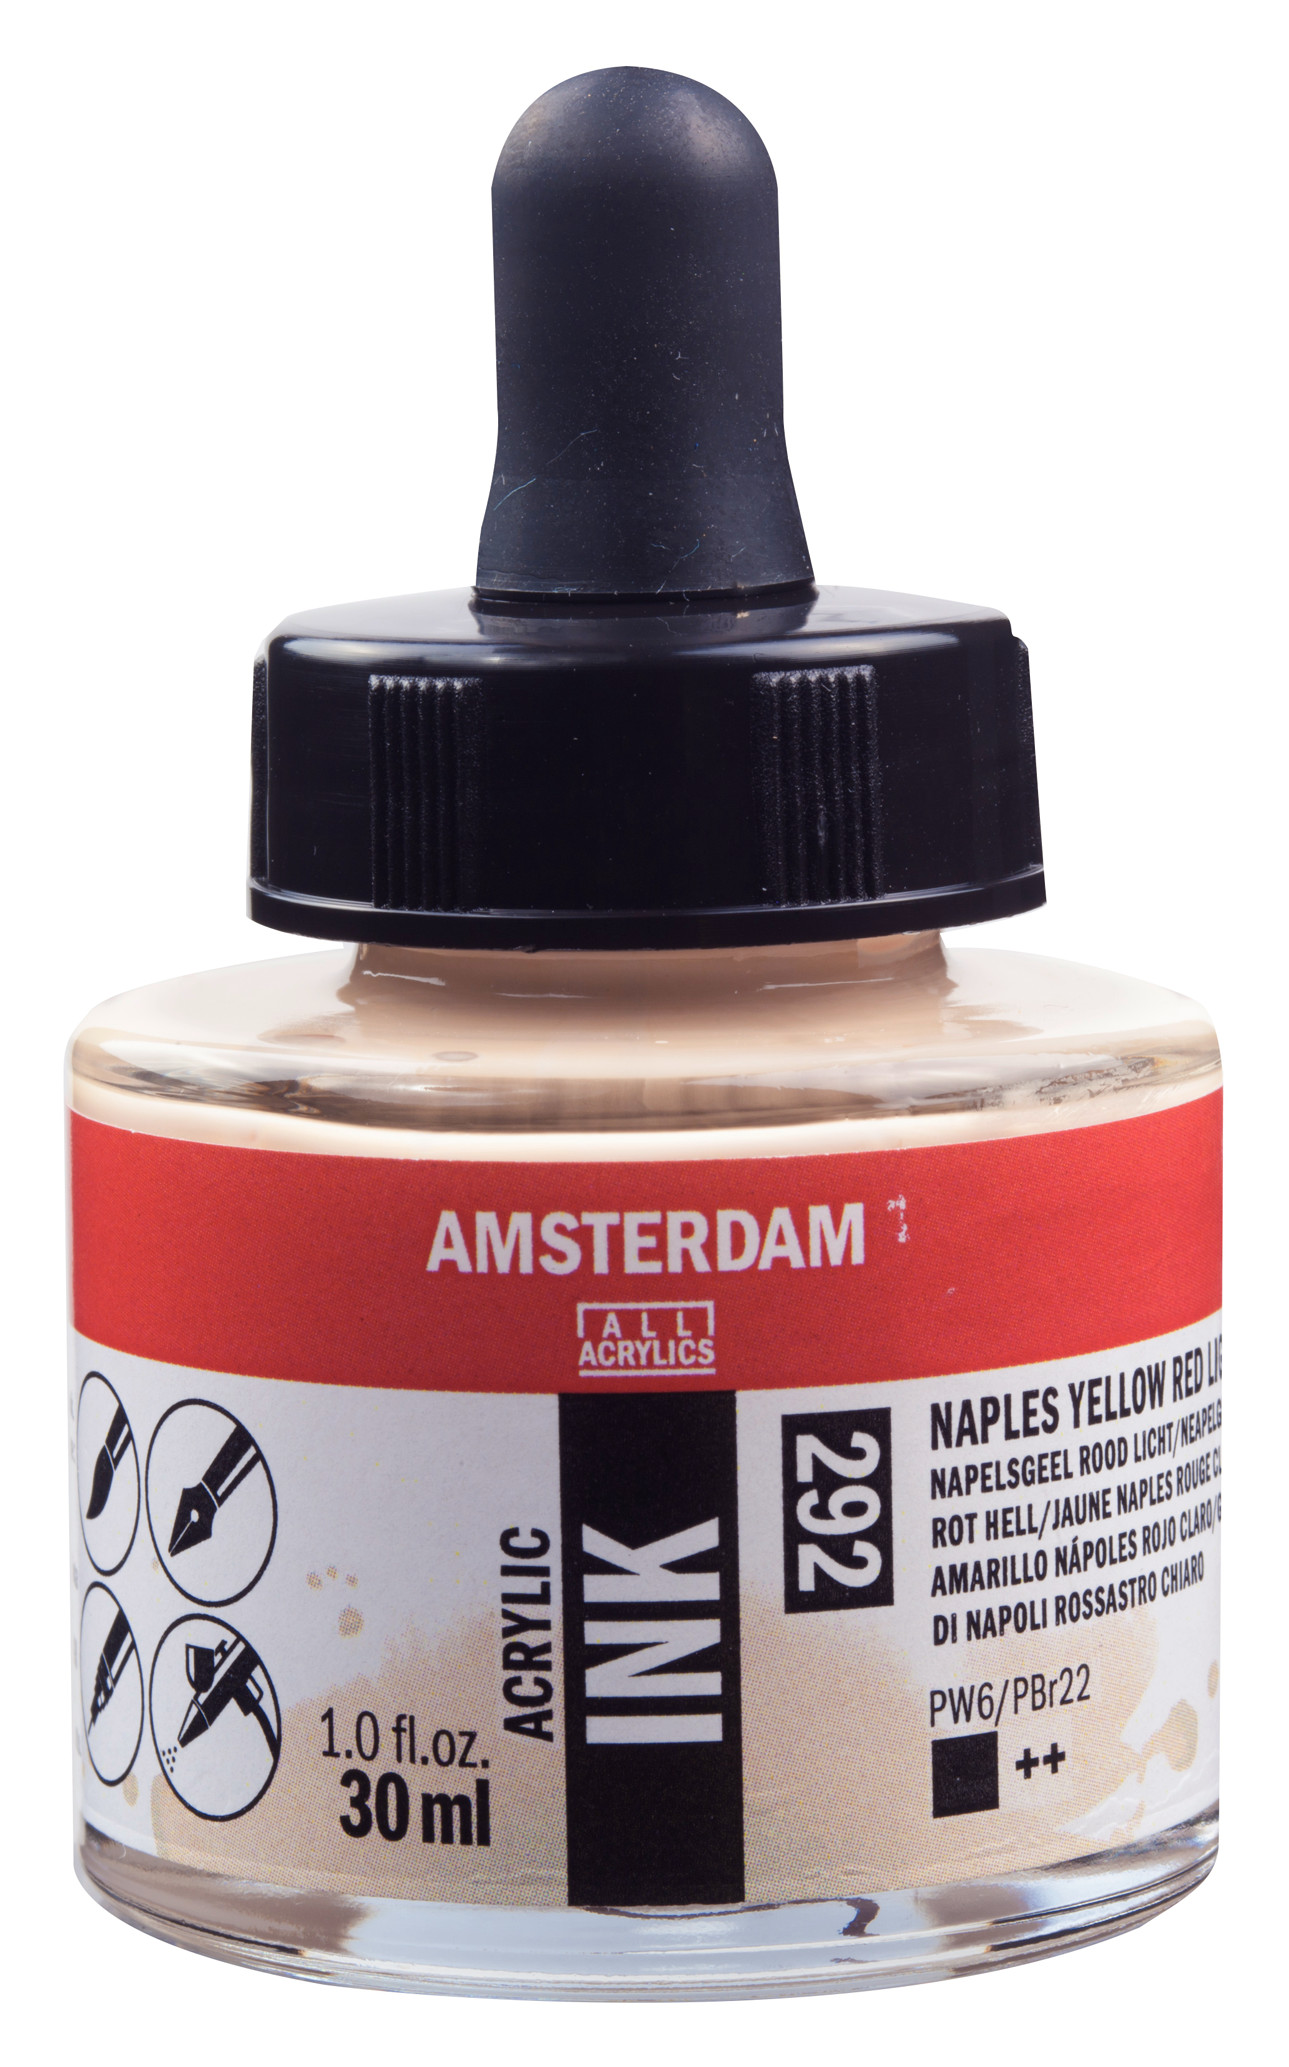 Amsterdam Acrylic Ink Bottle 30 ml Naples Yellow Red Light 292